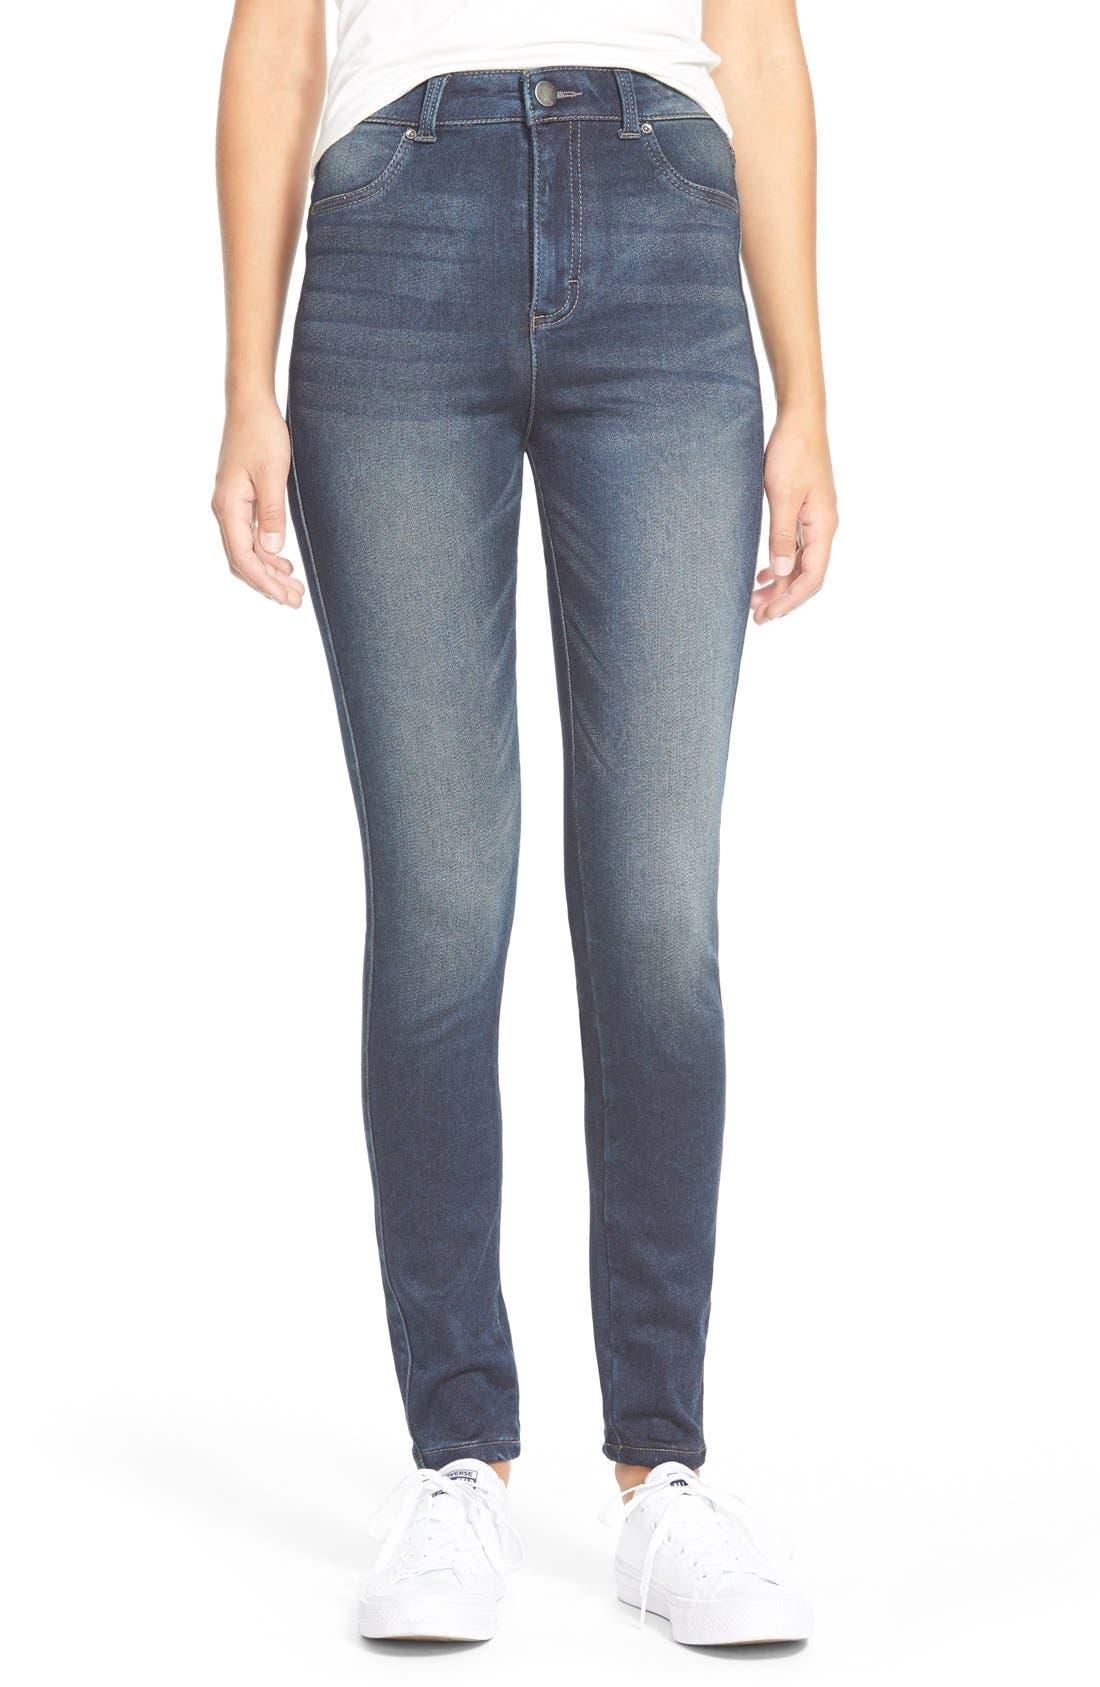 Alternate Image 1 Selected - Generra High Waist Skinny Jeans